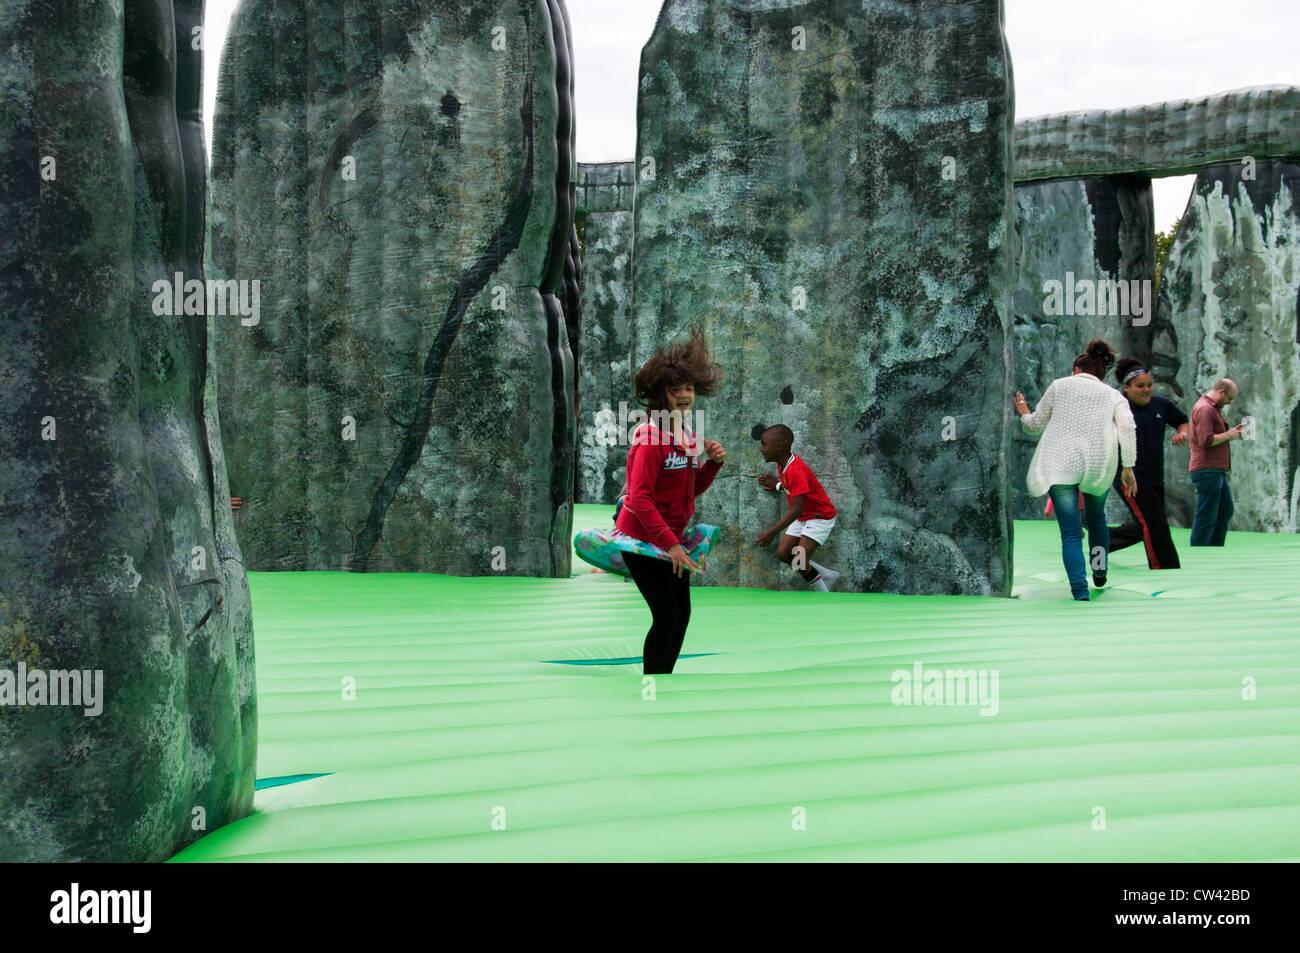 Sacriledge, Stonehenge Hüpfburg von Jeremy Deller, Teil der Kultur-Olympiade,, London Borough of Newham Stockbild